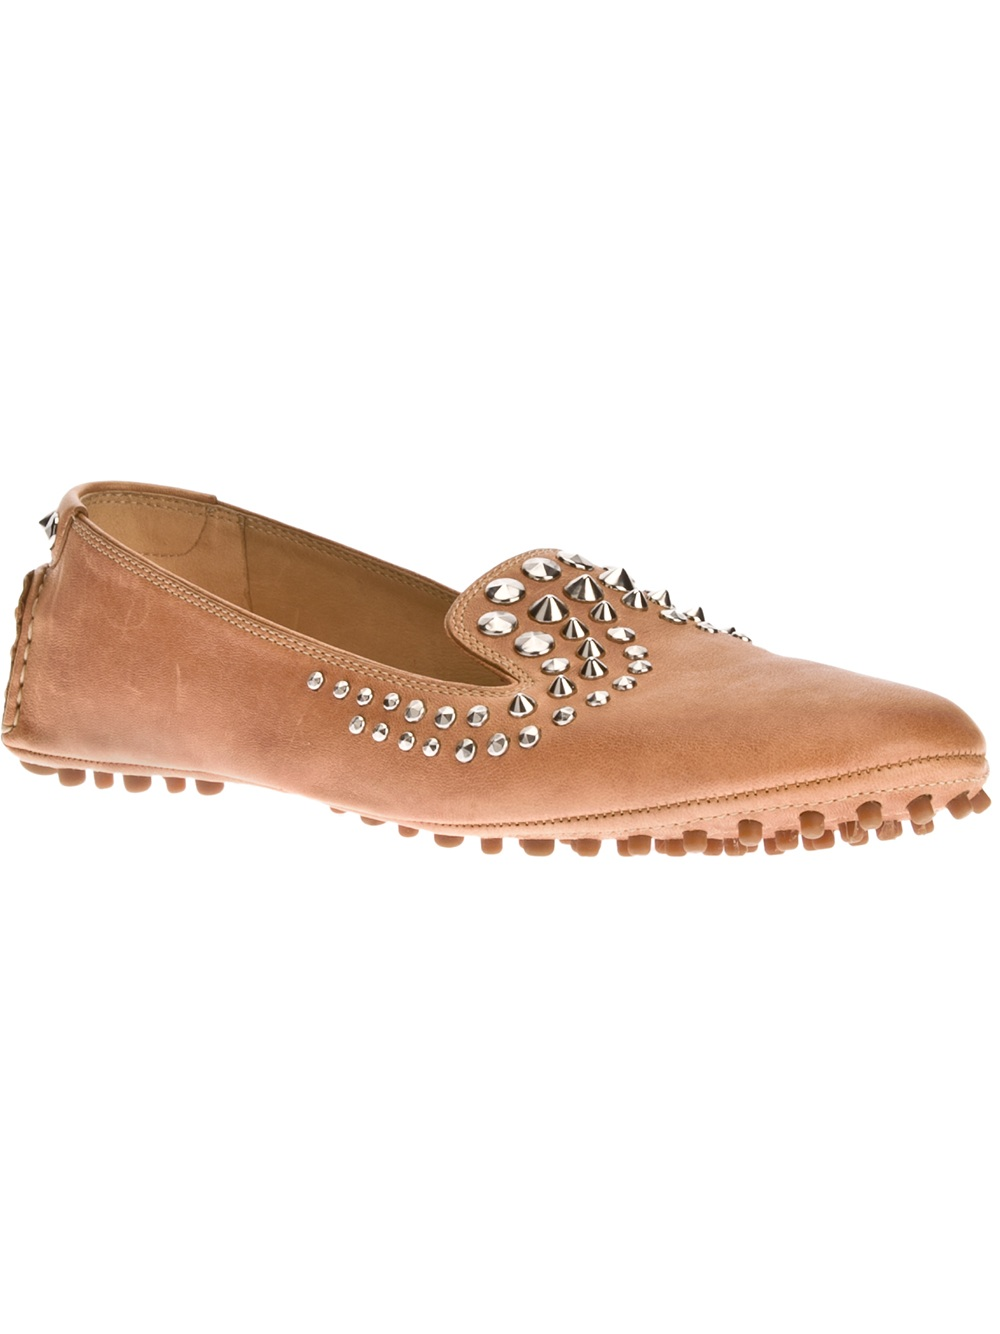 Shoe Land Flats